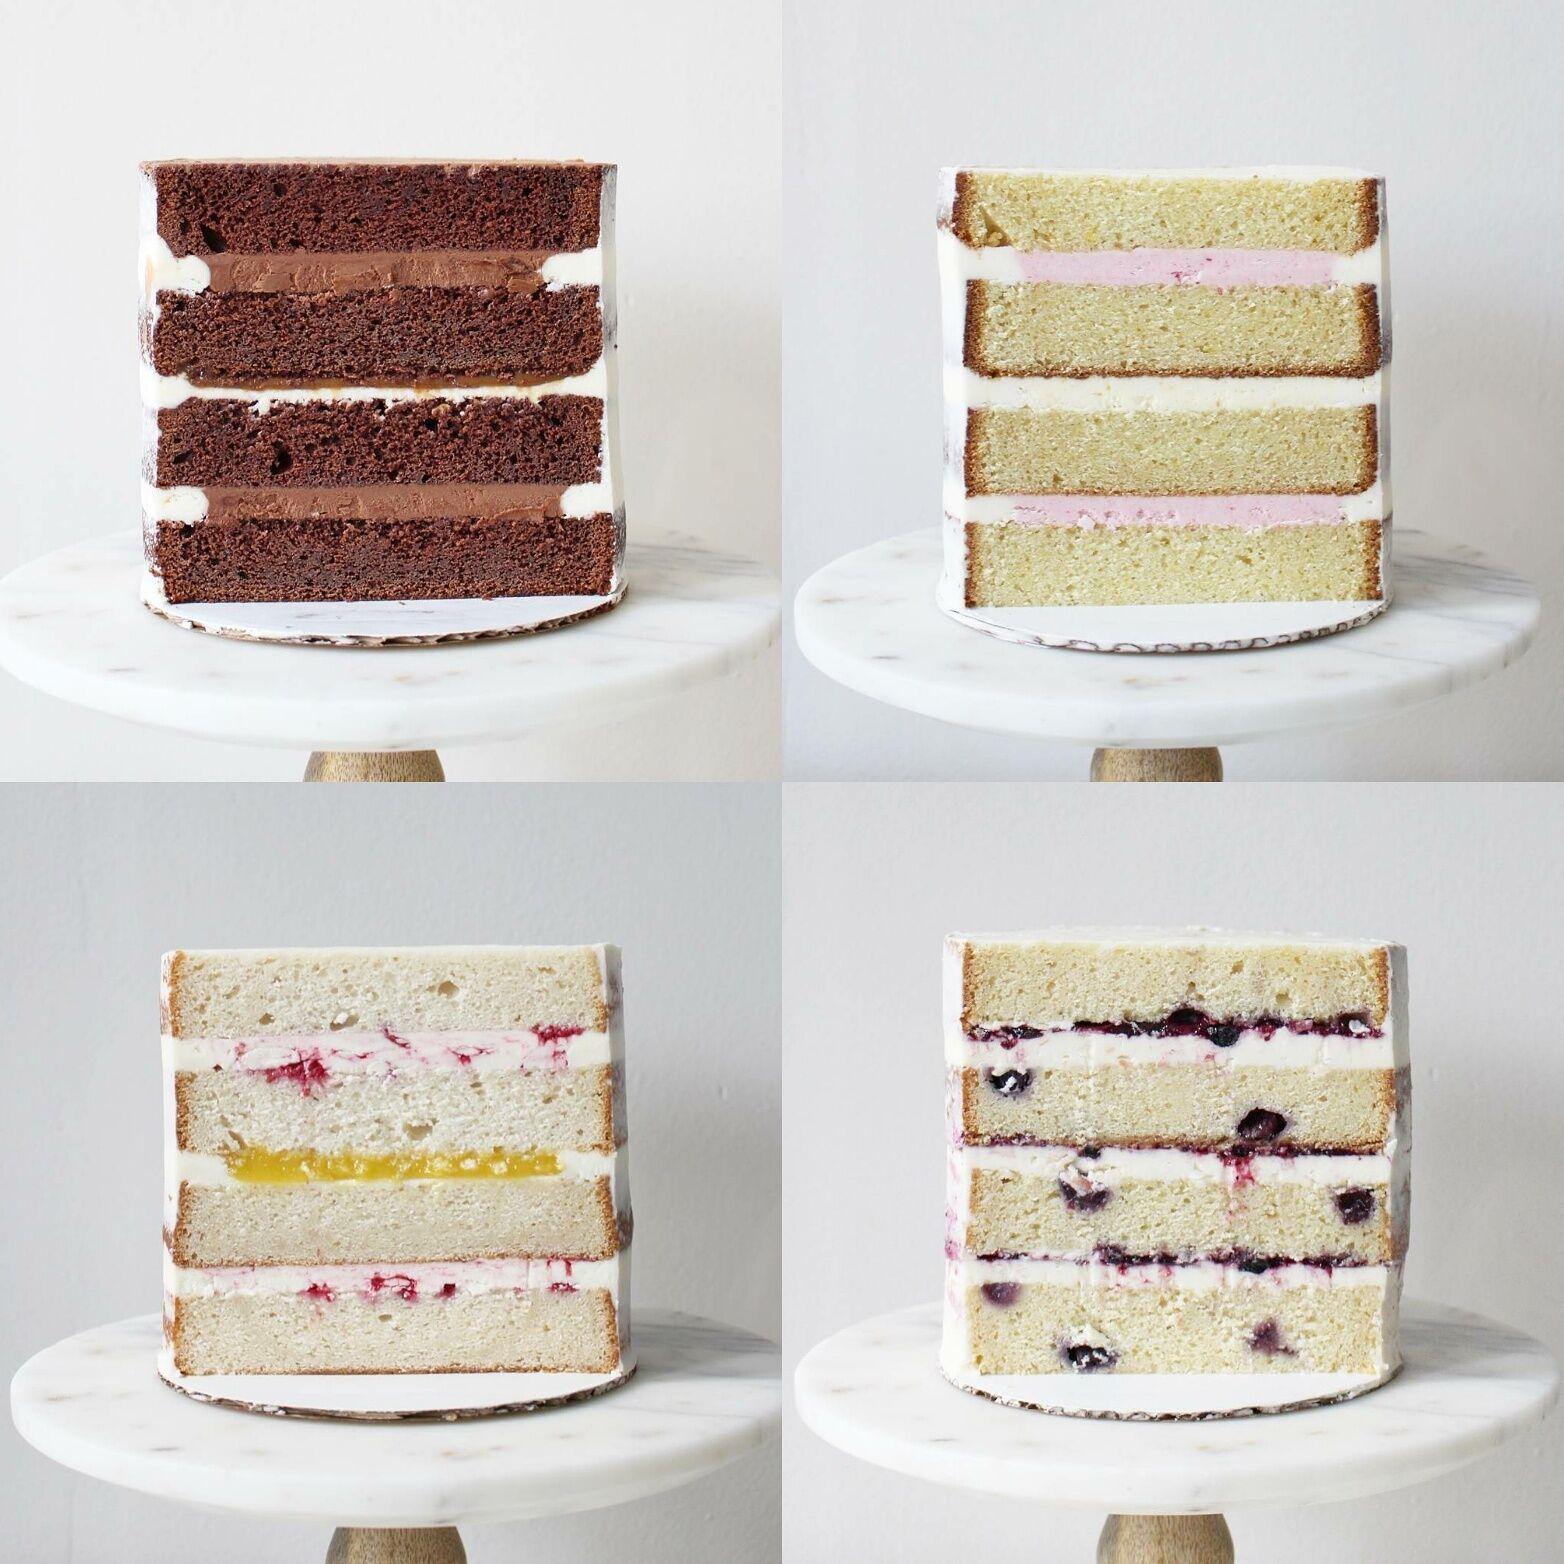 Wedding Cake Bakeries In Boston - 5000+ Simple Wedding Cakes